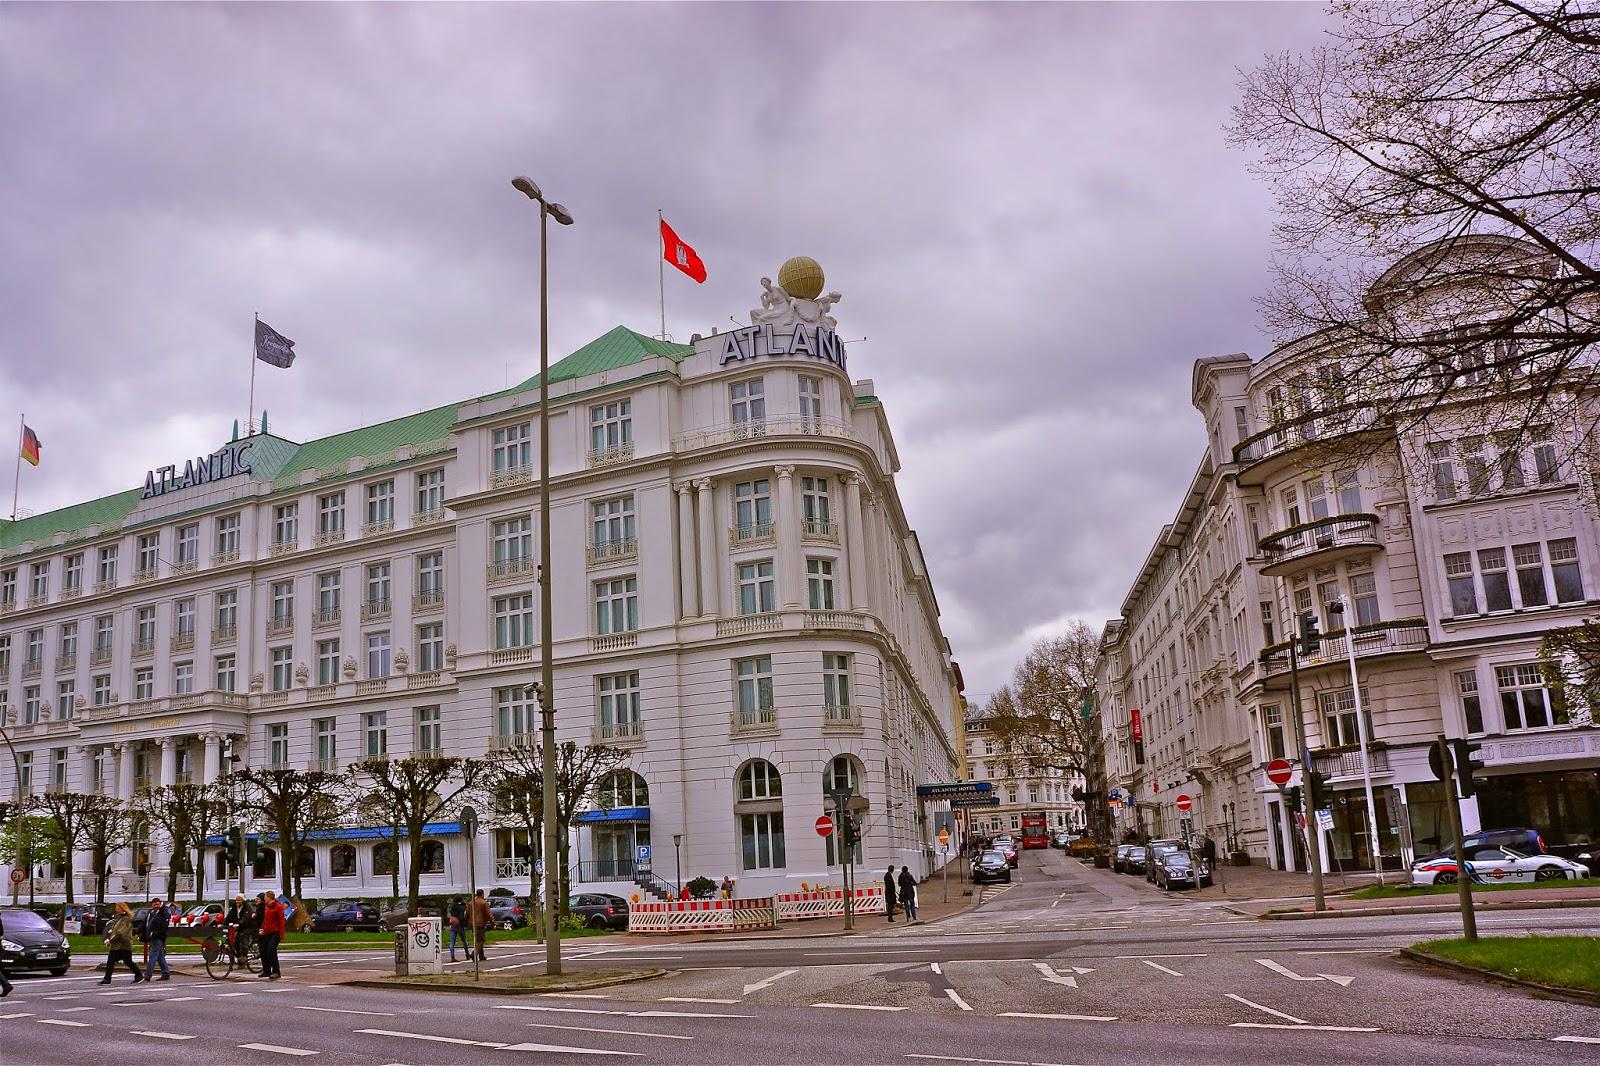 Picture of the Atlantic Kempinski Hotel in Hamburg, Germany.